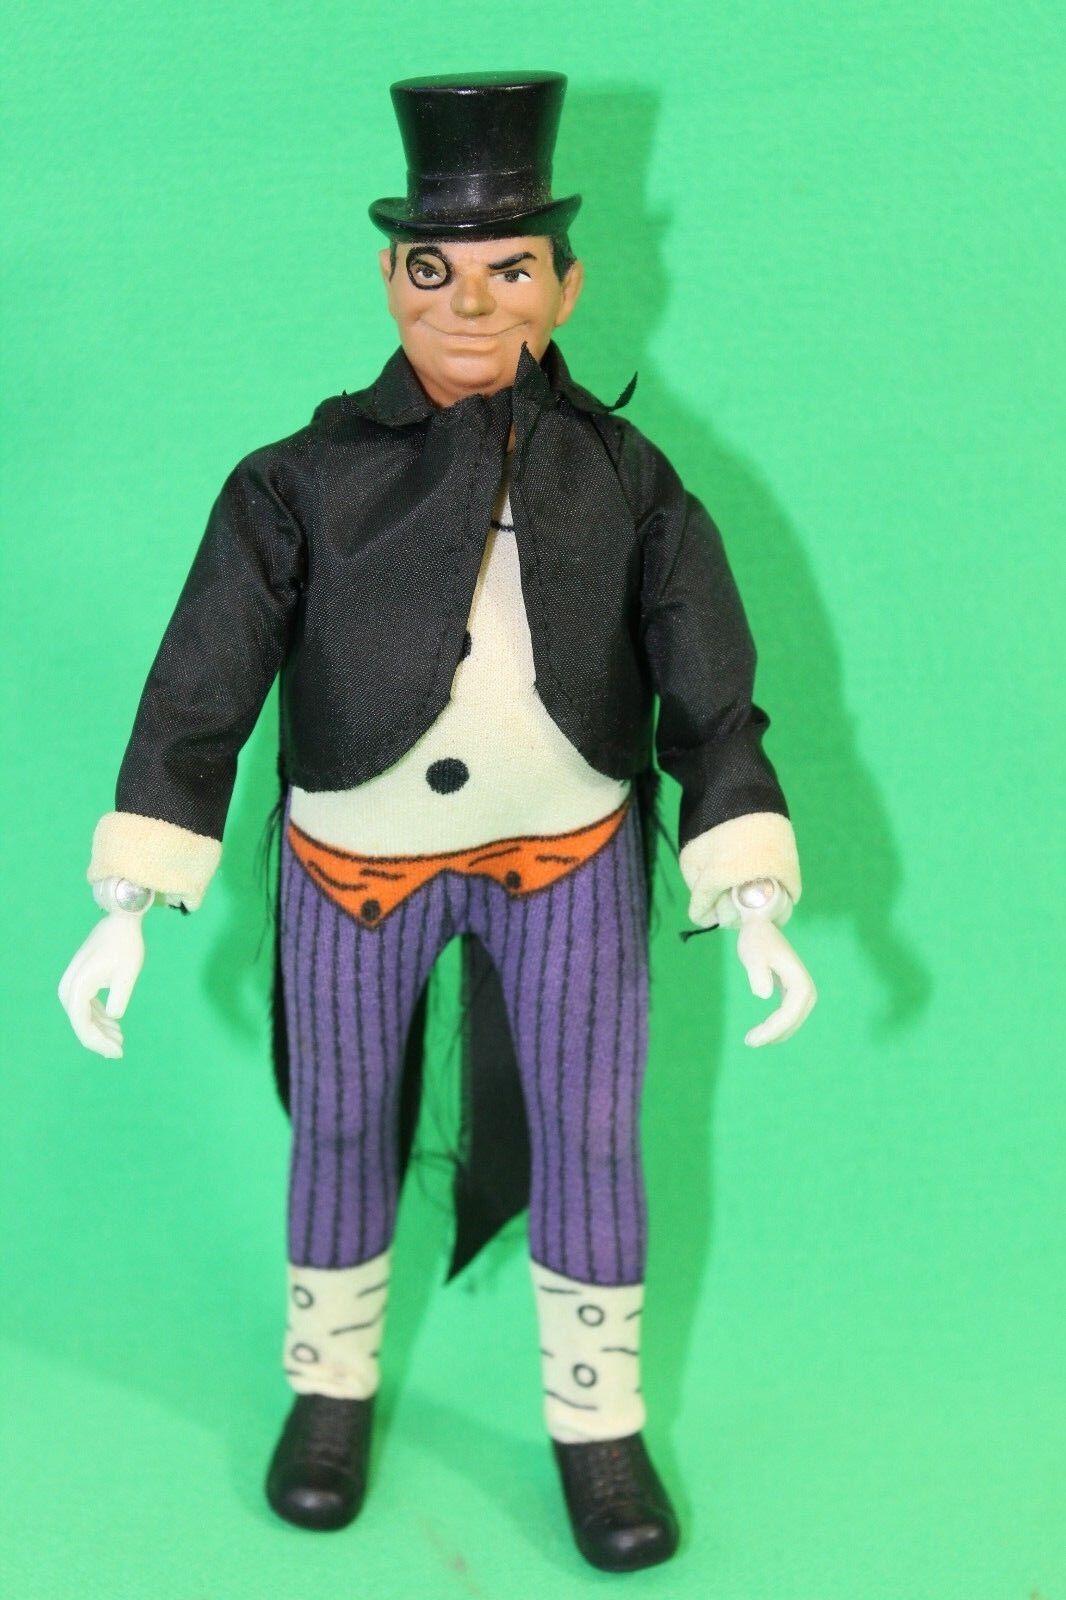 1973 Mego WGSH Penguin Type 1 Action Figure